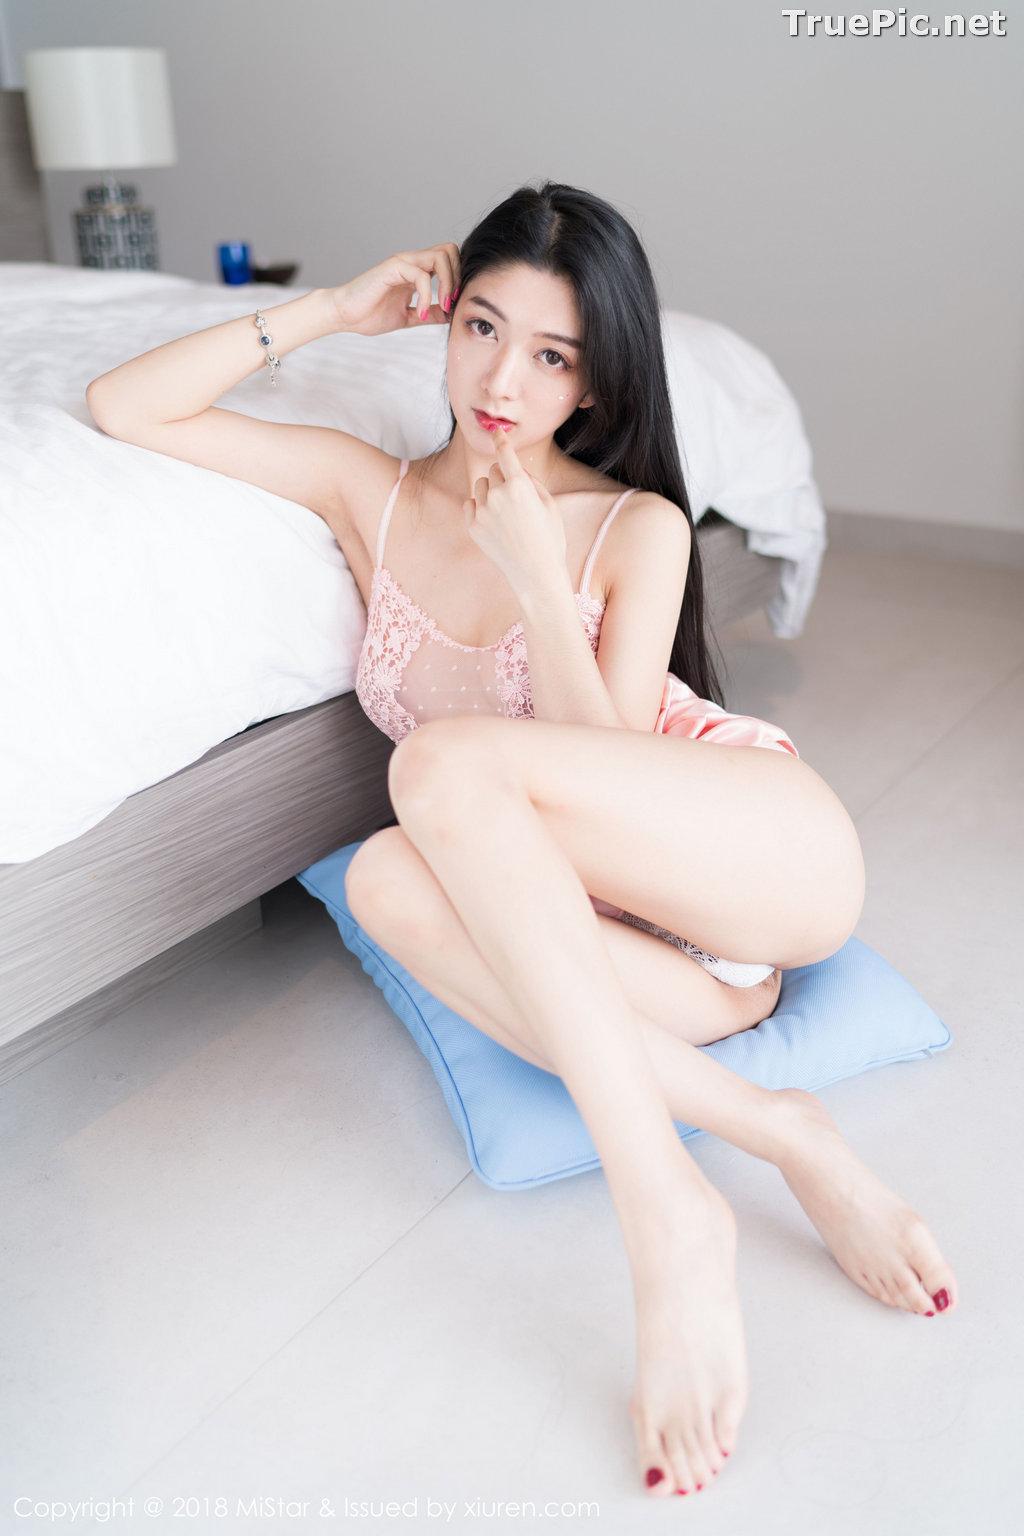 Image MiStar Vol.238 - Chinese Model - Xiao Reba (Angela小热巴) - Sleep Dress and Monokini - TruePic.net - Picture-29